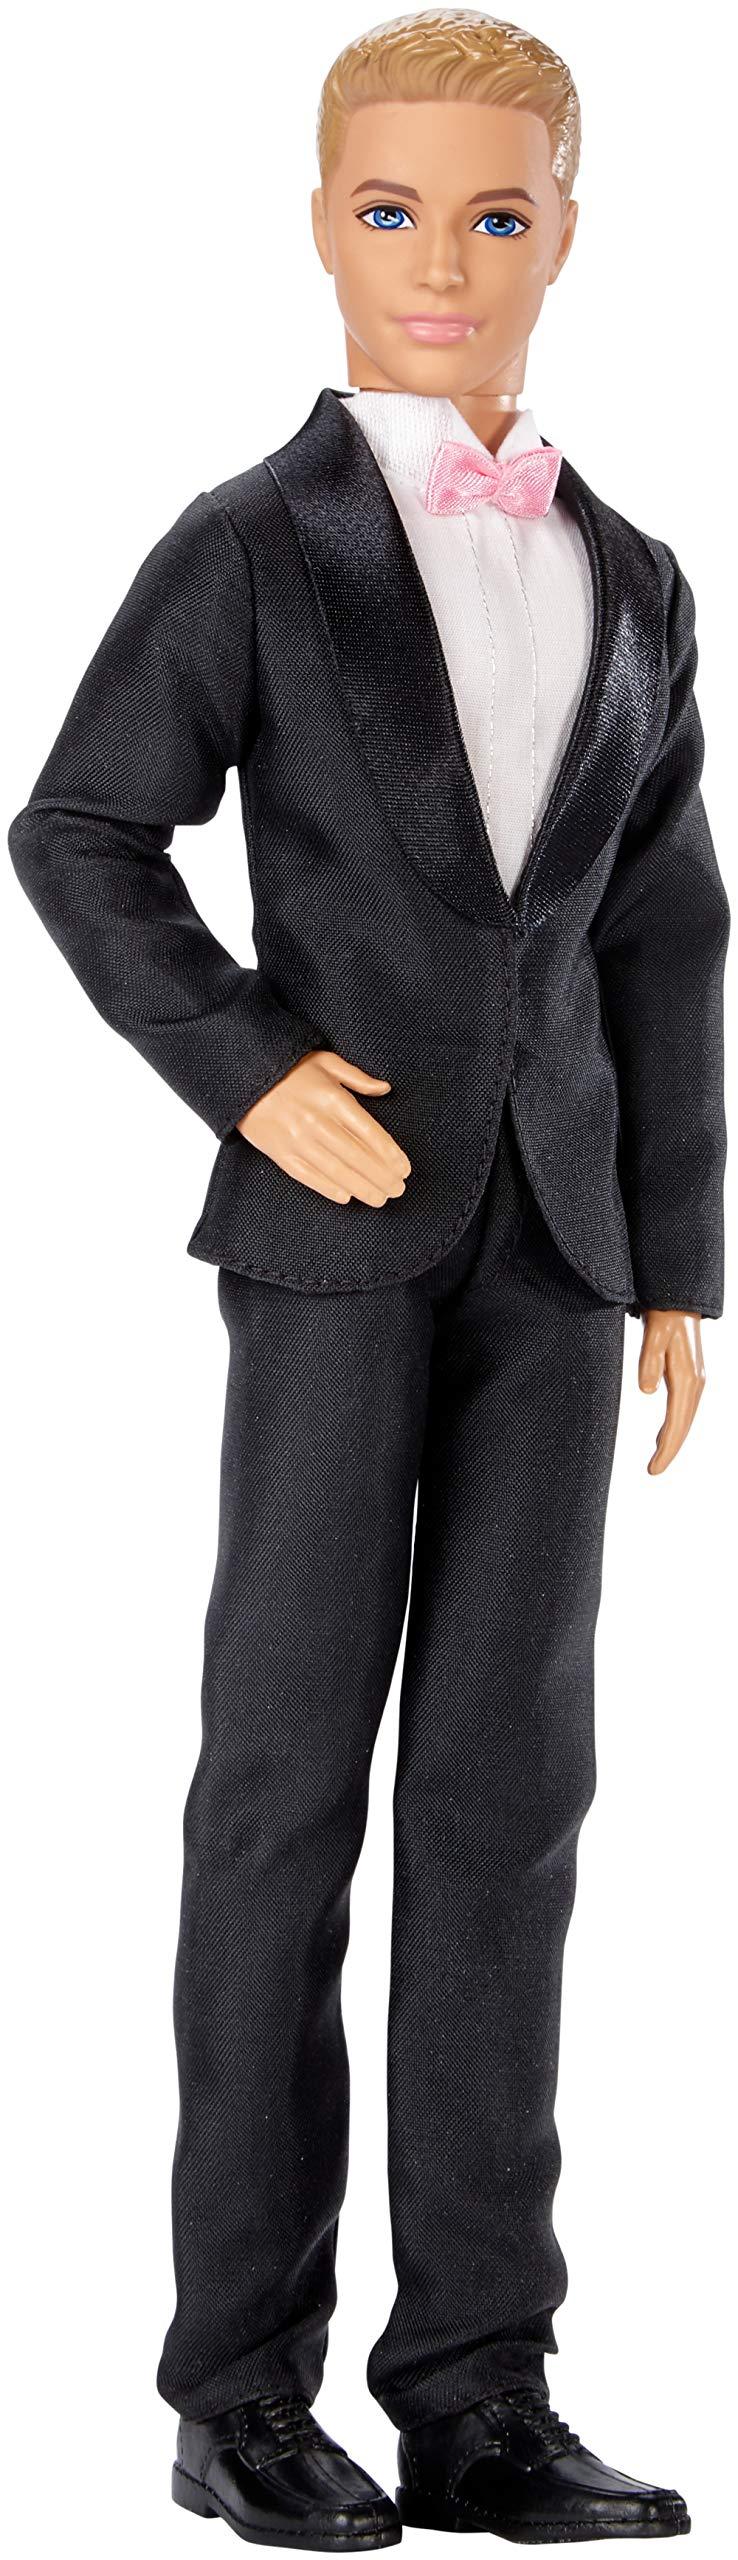 Barbie Fairytale Groom Ken Doll in Tuxedo [Amazon Exclusive]